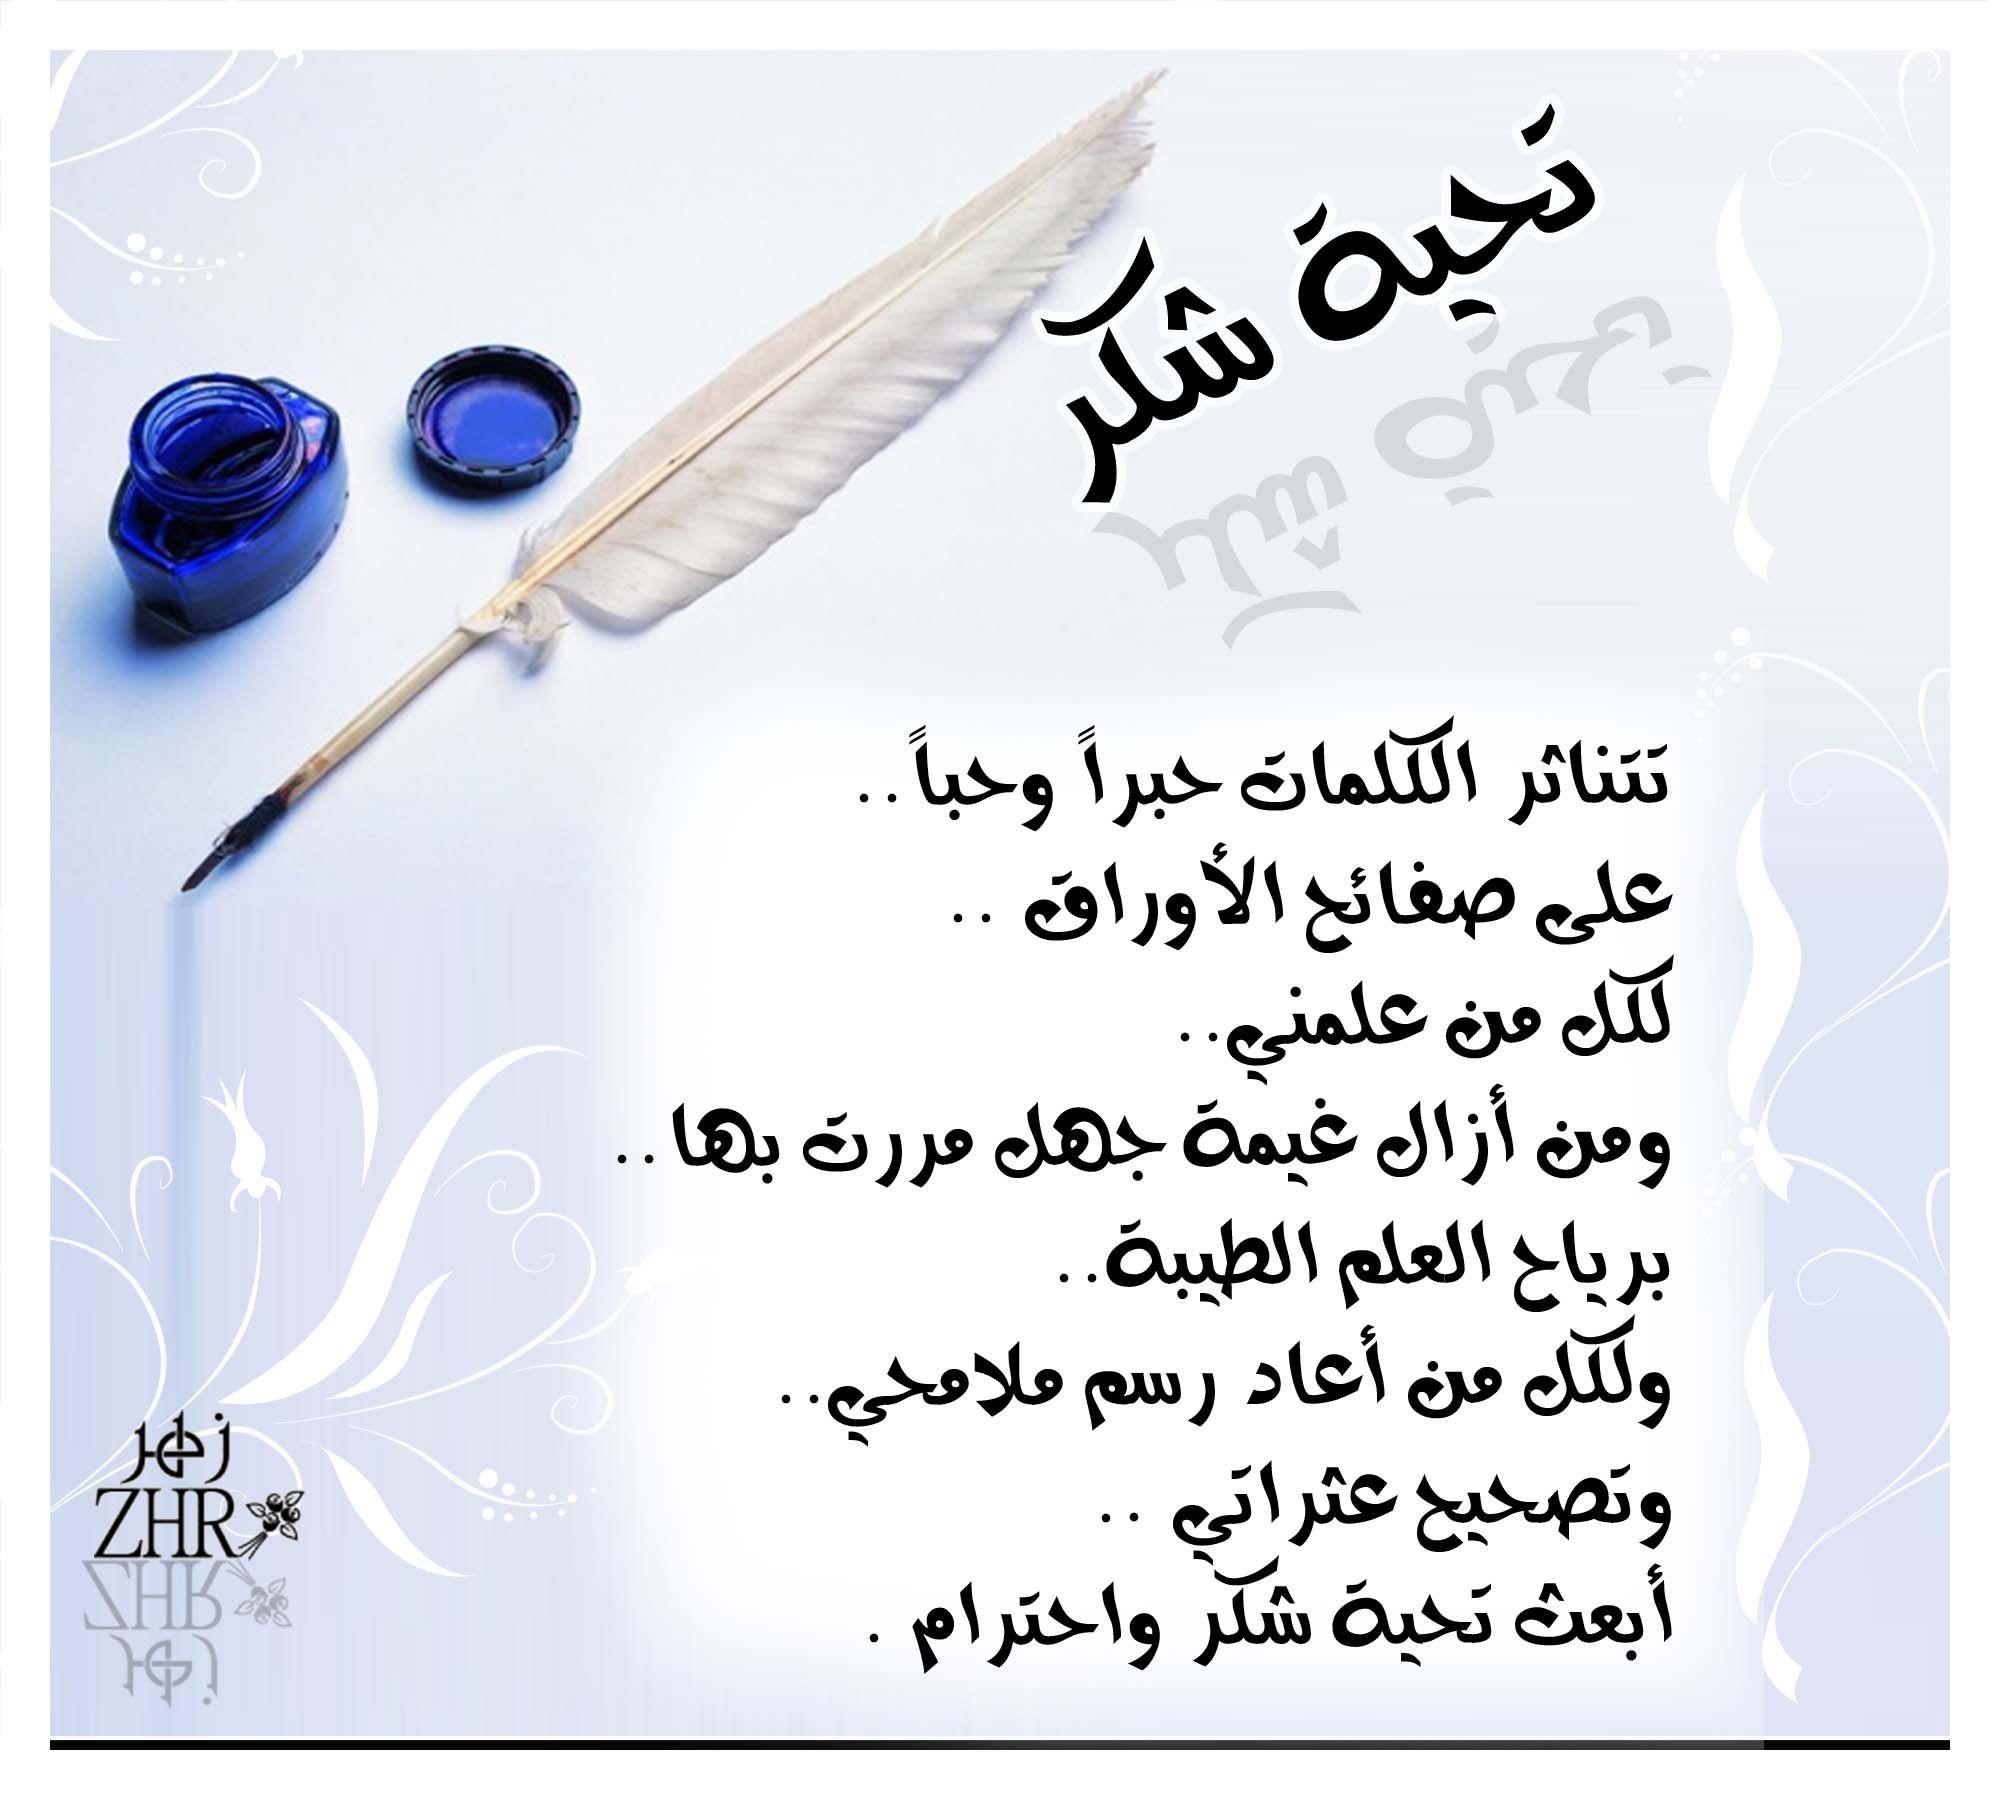 C7ca9ed625bfdf3947cd965ded45d008 Jpg 2000 1800 Arabic Love Quotes Teacher Quotes Love Quotes